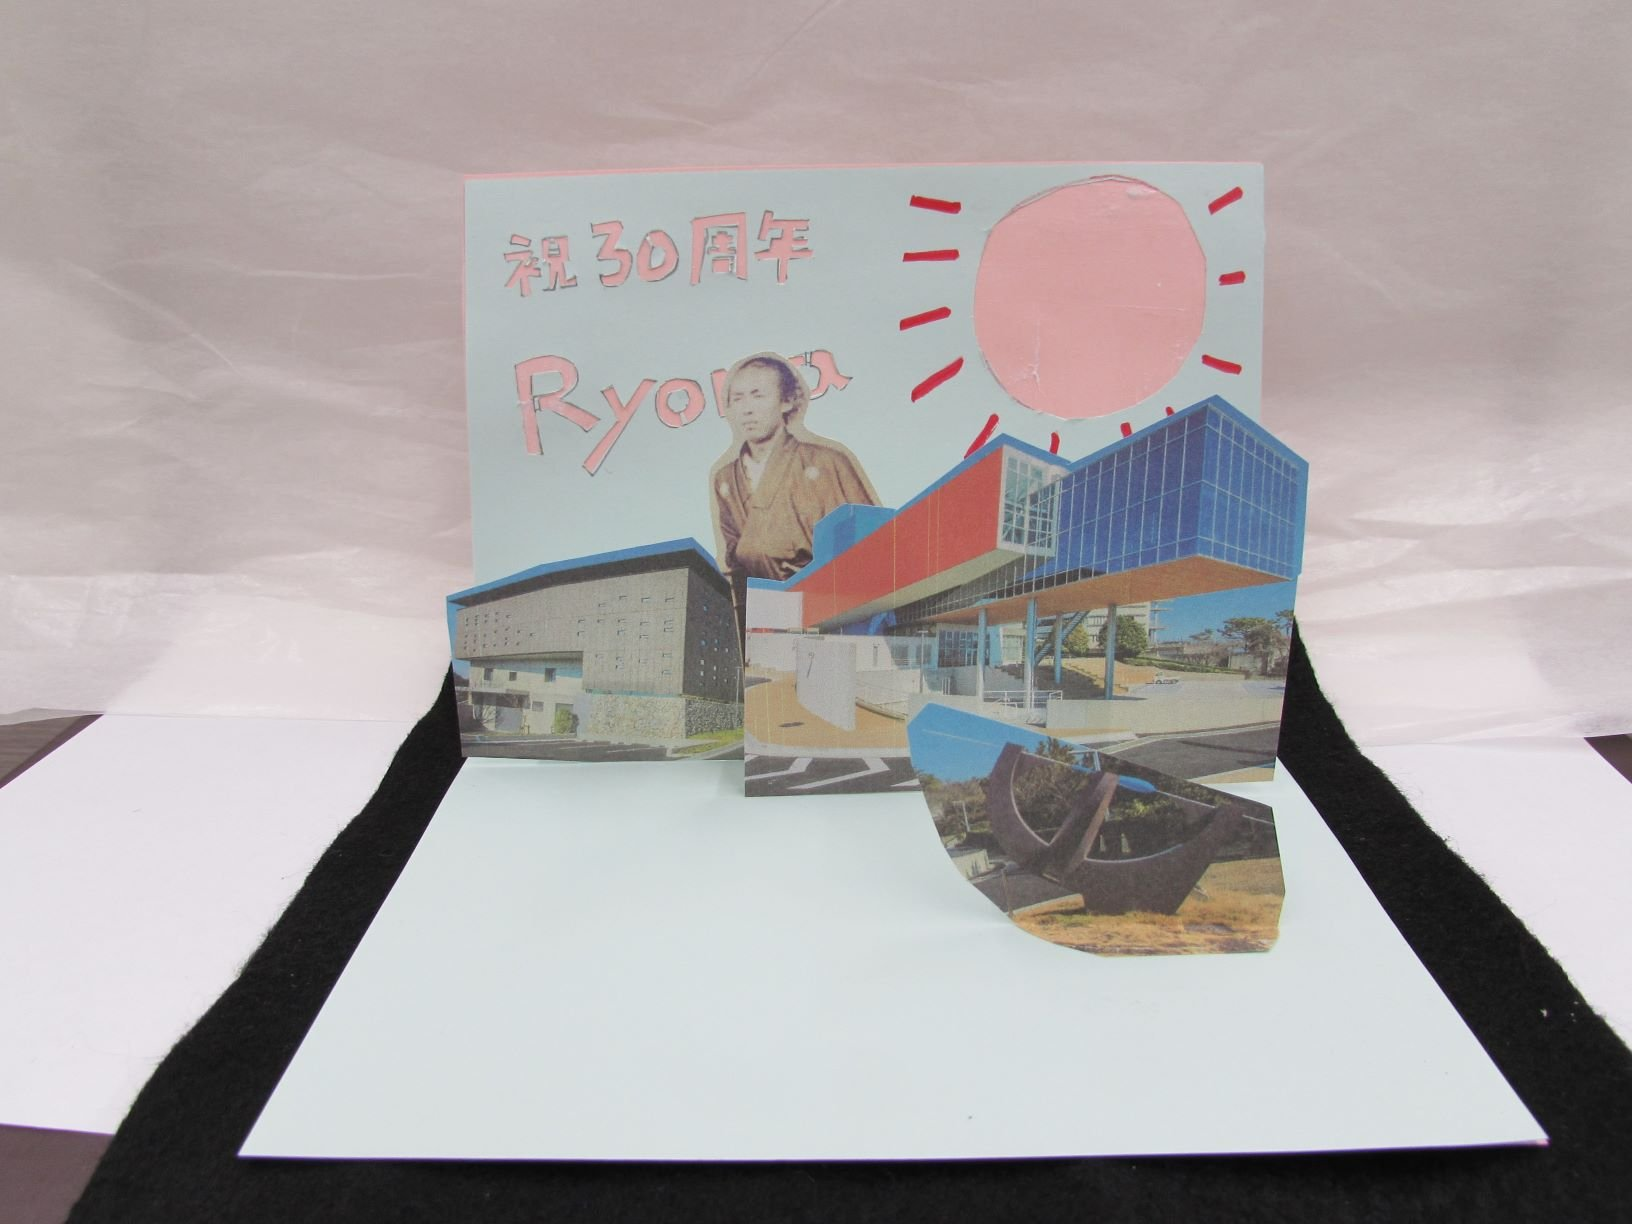 2mg  立体カードで龍馬記念館をつくろう!.JPG